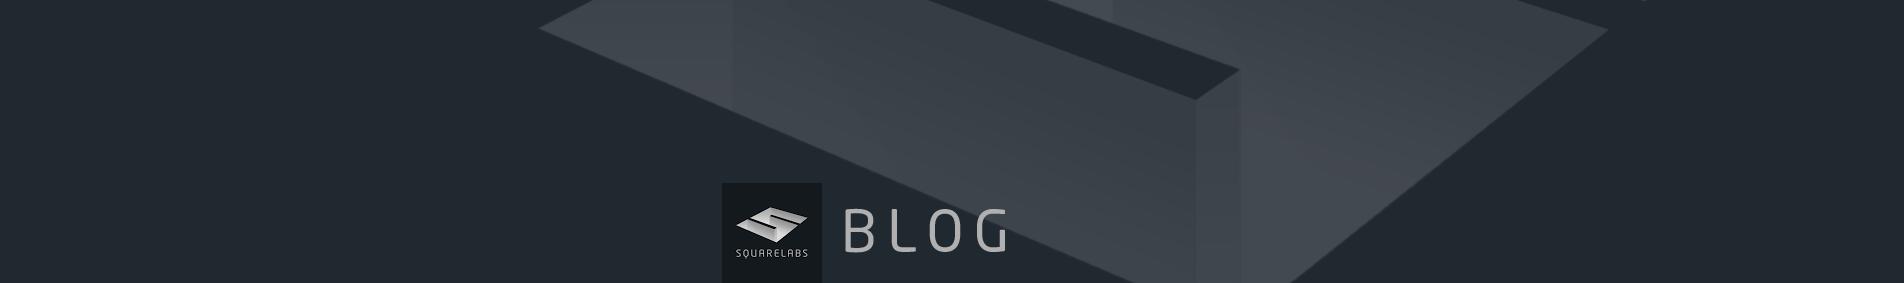 squarelabs blog